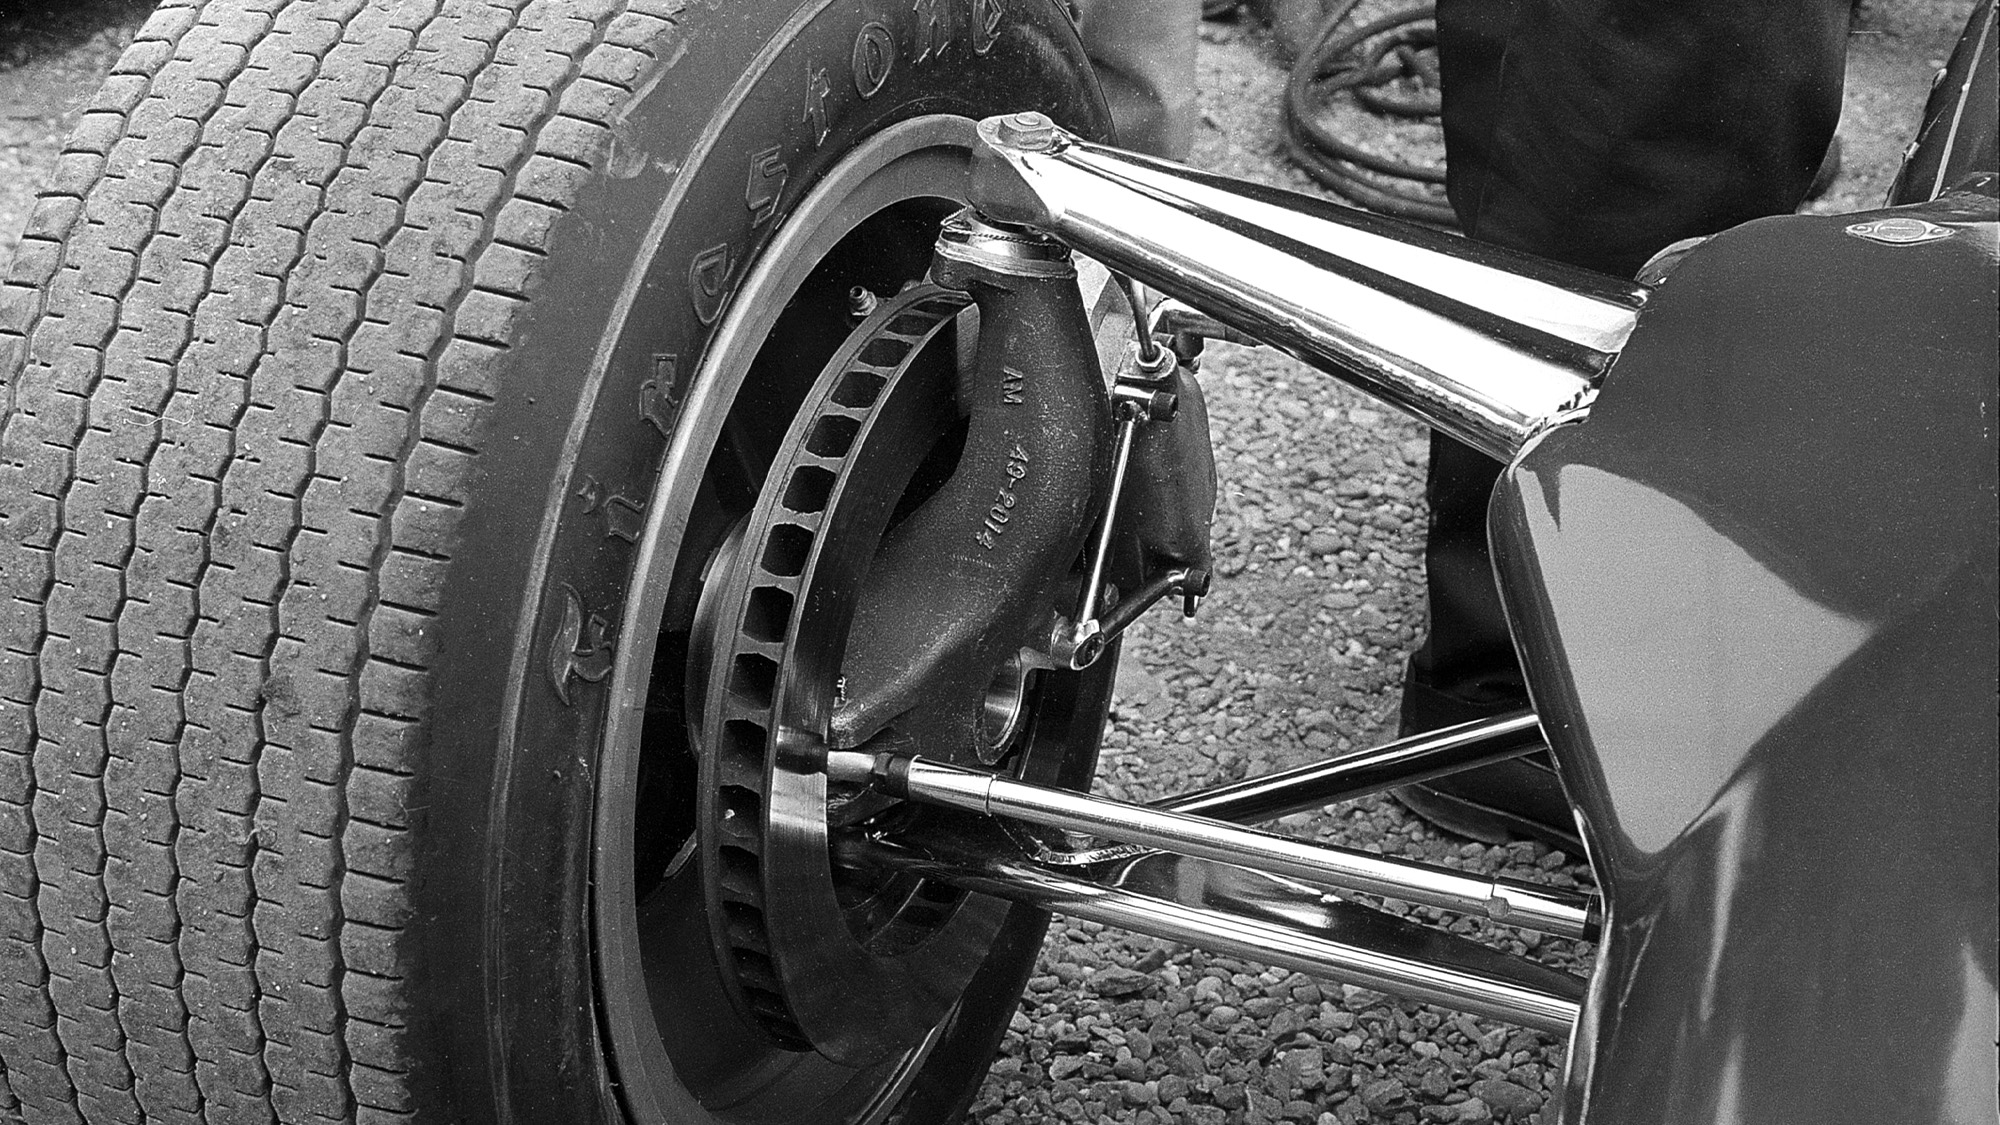 Lotus suspension at Zandvoort in 1957